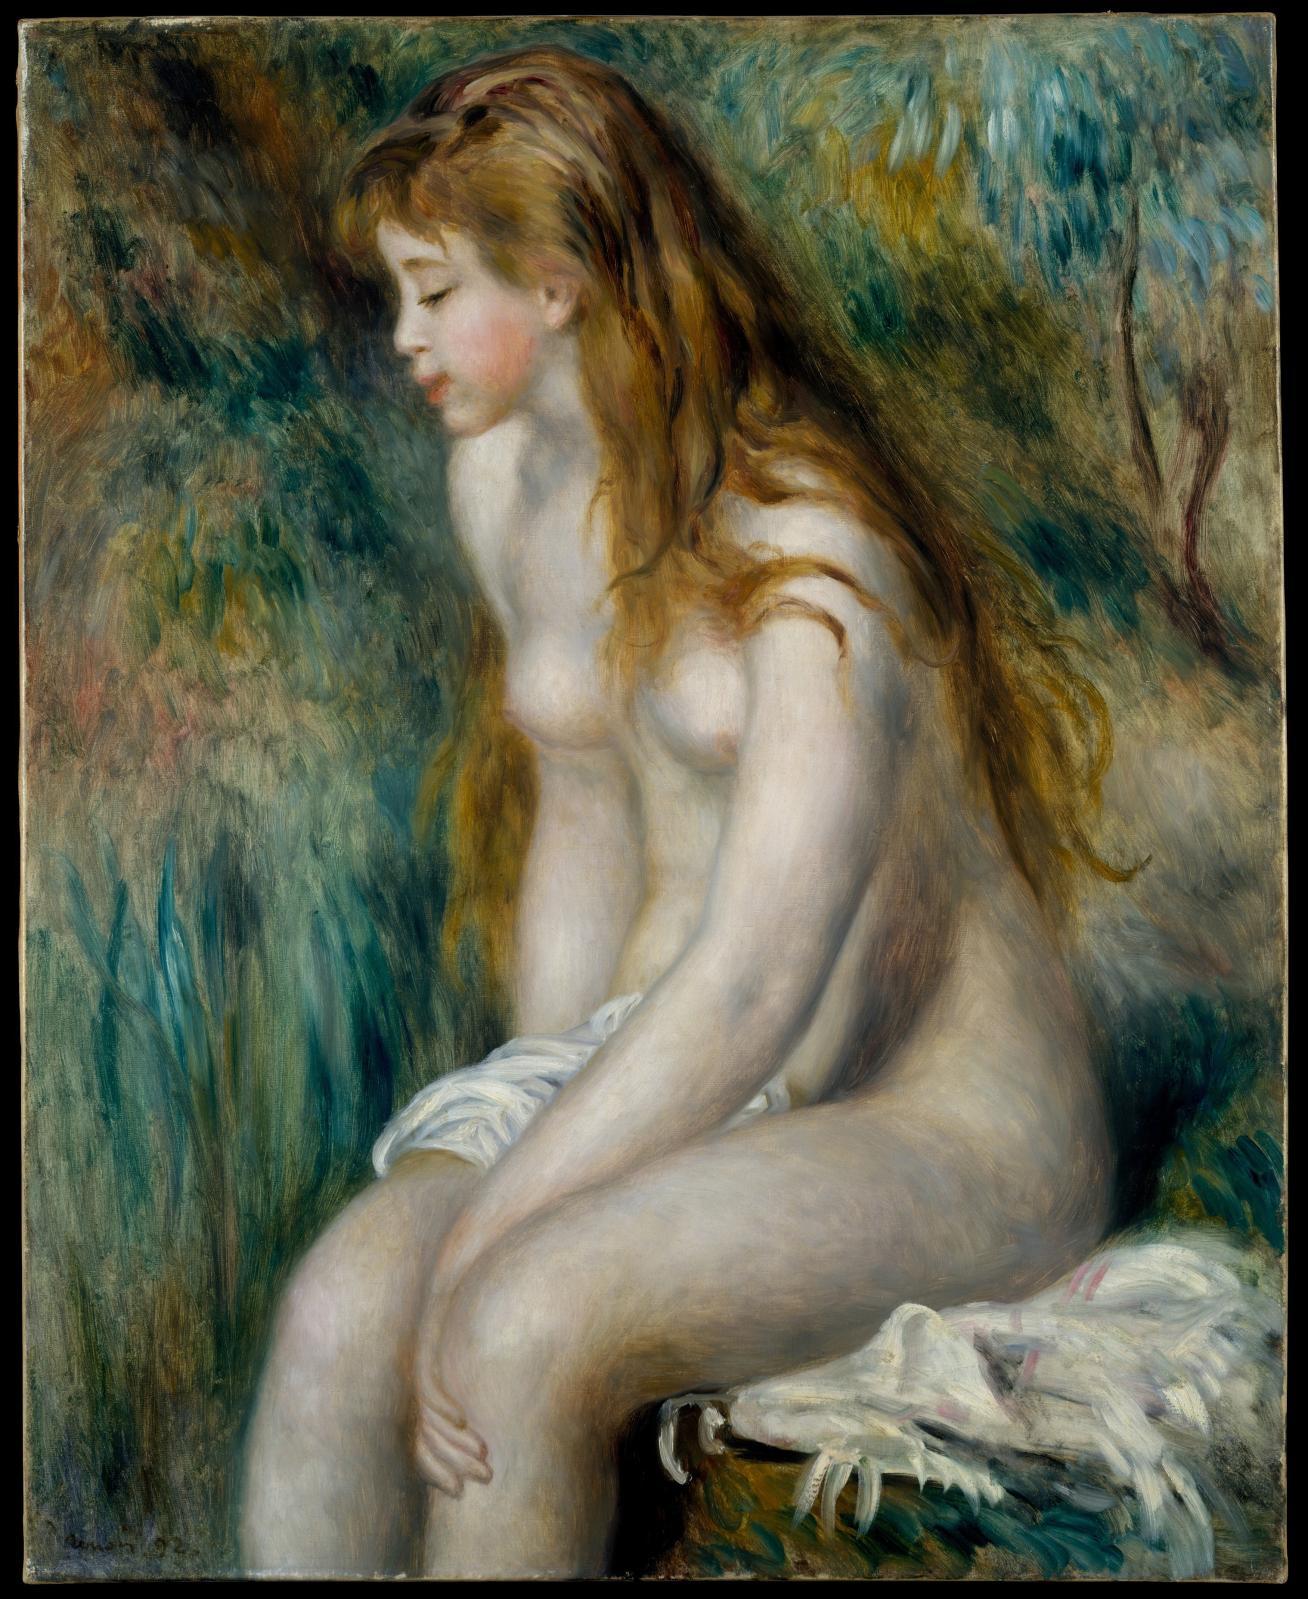 Pierre-Auguste Renoir, Jeune fille au bain, 1892, huile sur toile, 81,3x64,8cm, NewYork, The Metropolitan Museum of Art, Robert Lehman Collection.